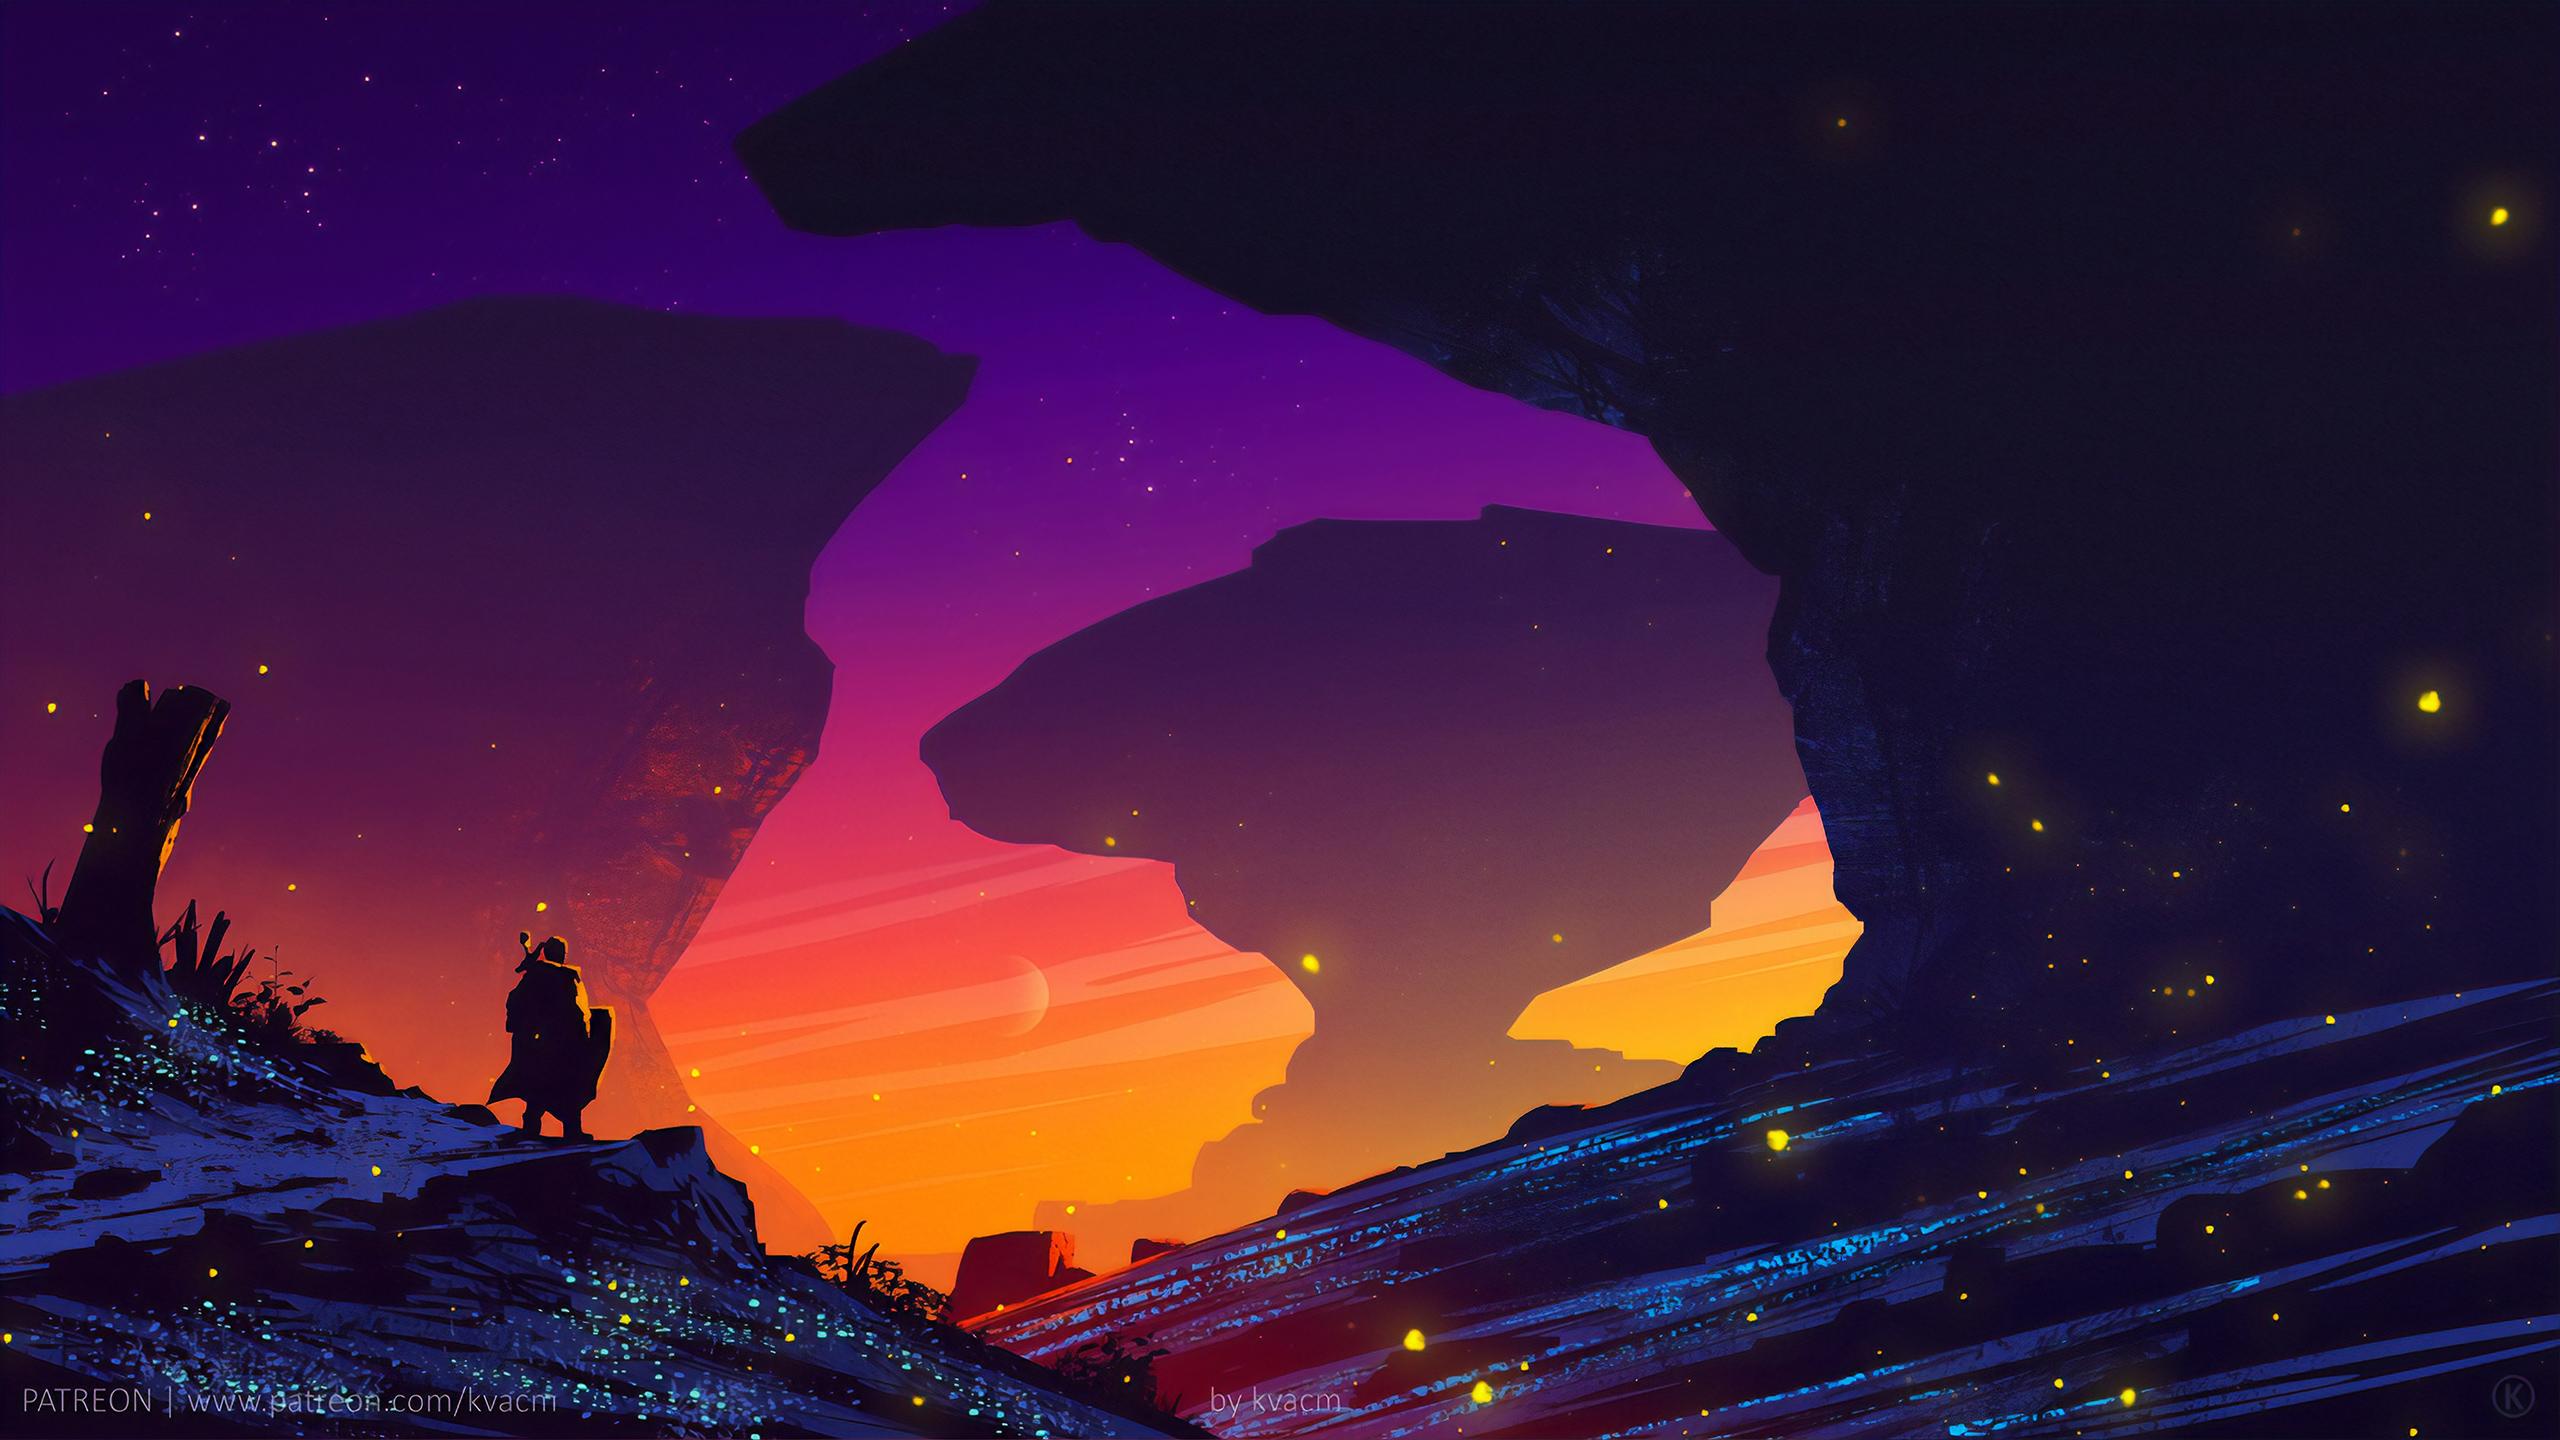 General 2560x1440 digital digital art artwork fantasy art knight silhouette sunset evening landscape digital painting dusk sky rocks stars fairies synthwave Sun